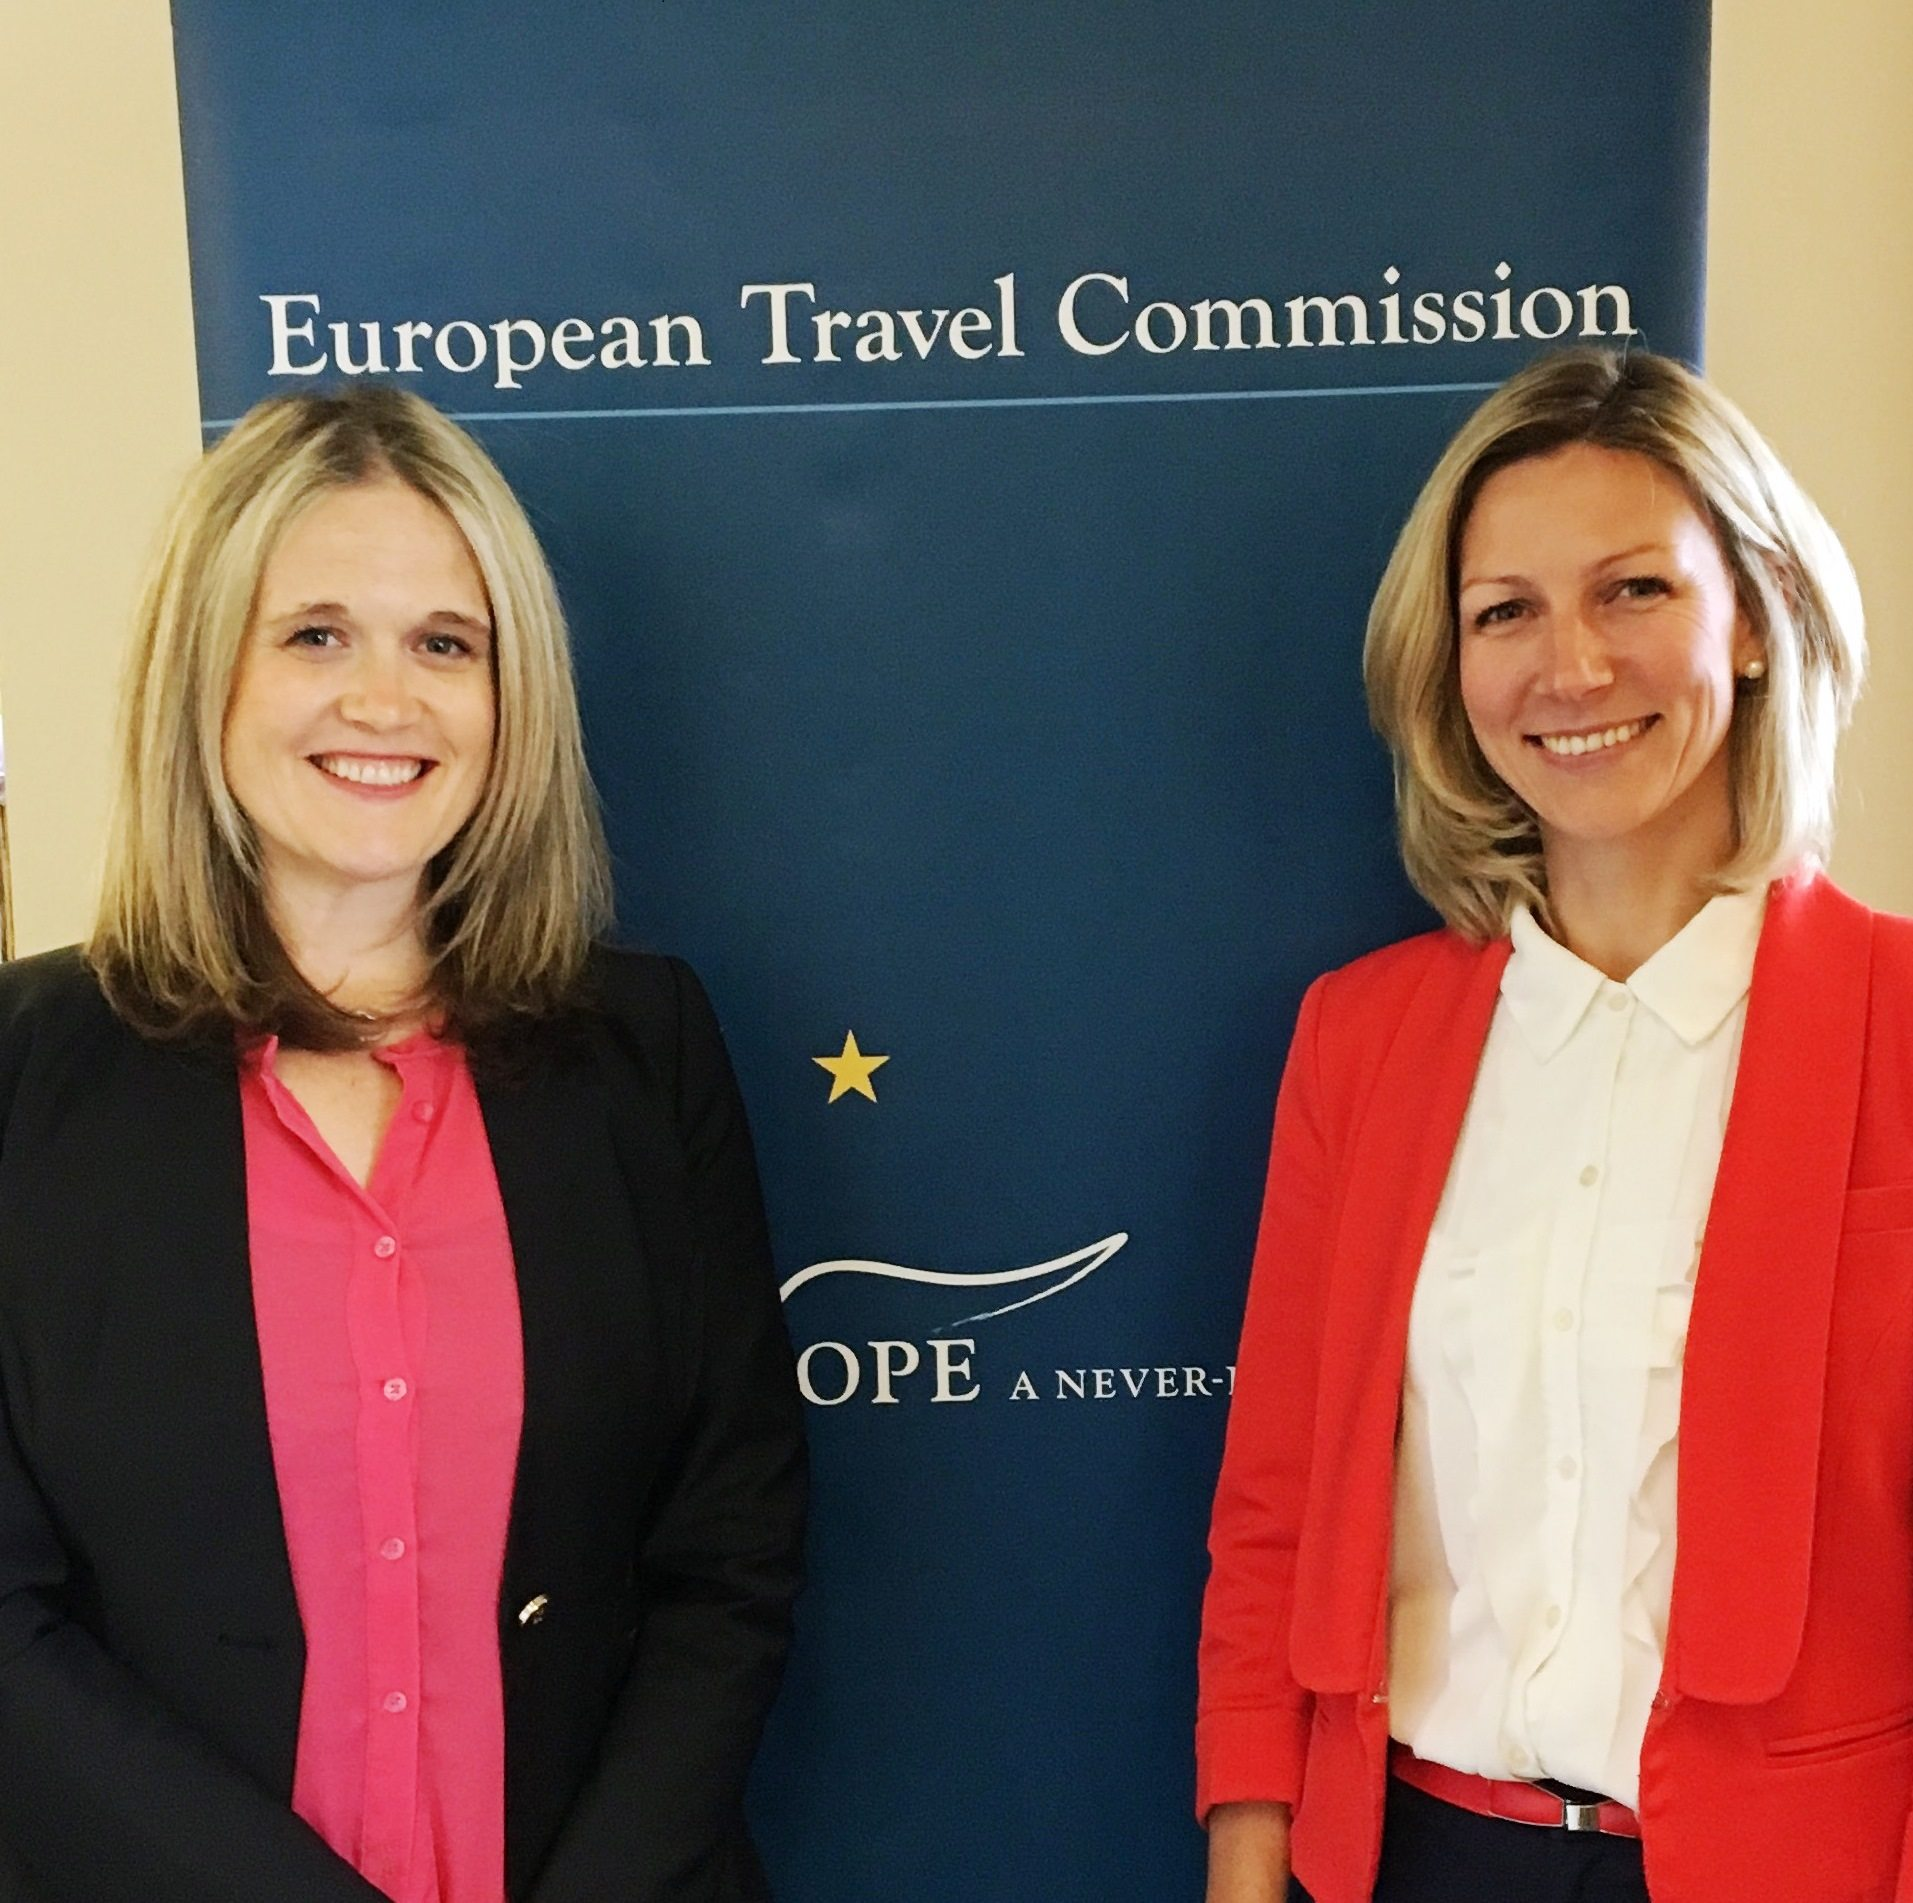 European Travel Commission (ETC) announces new appointment